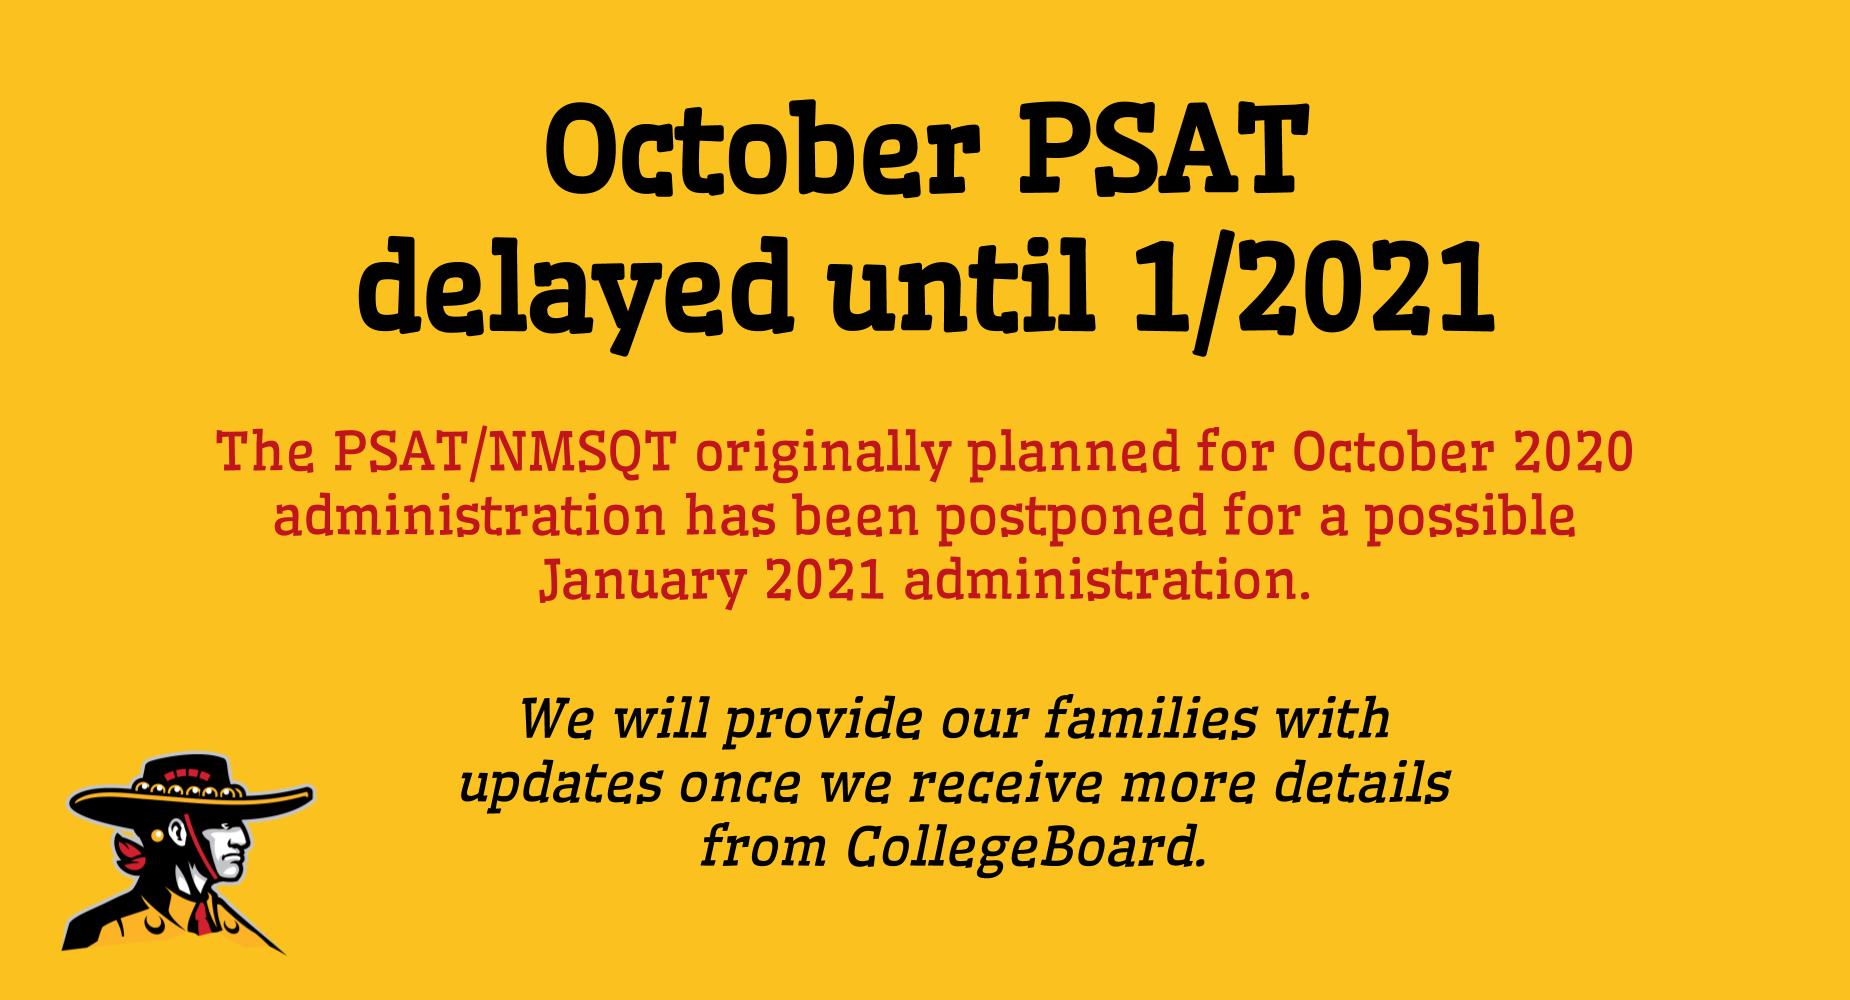 PSAT delayed